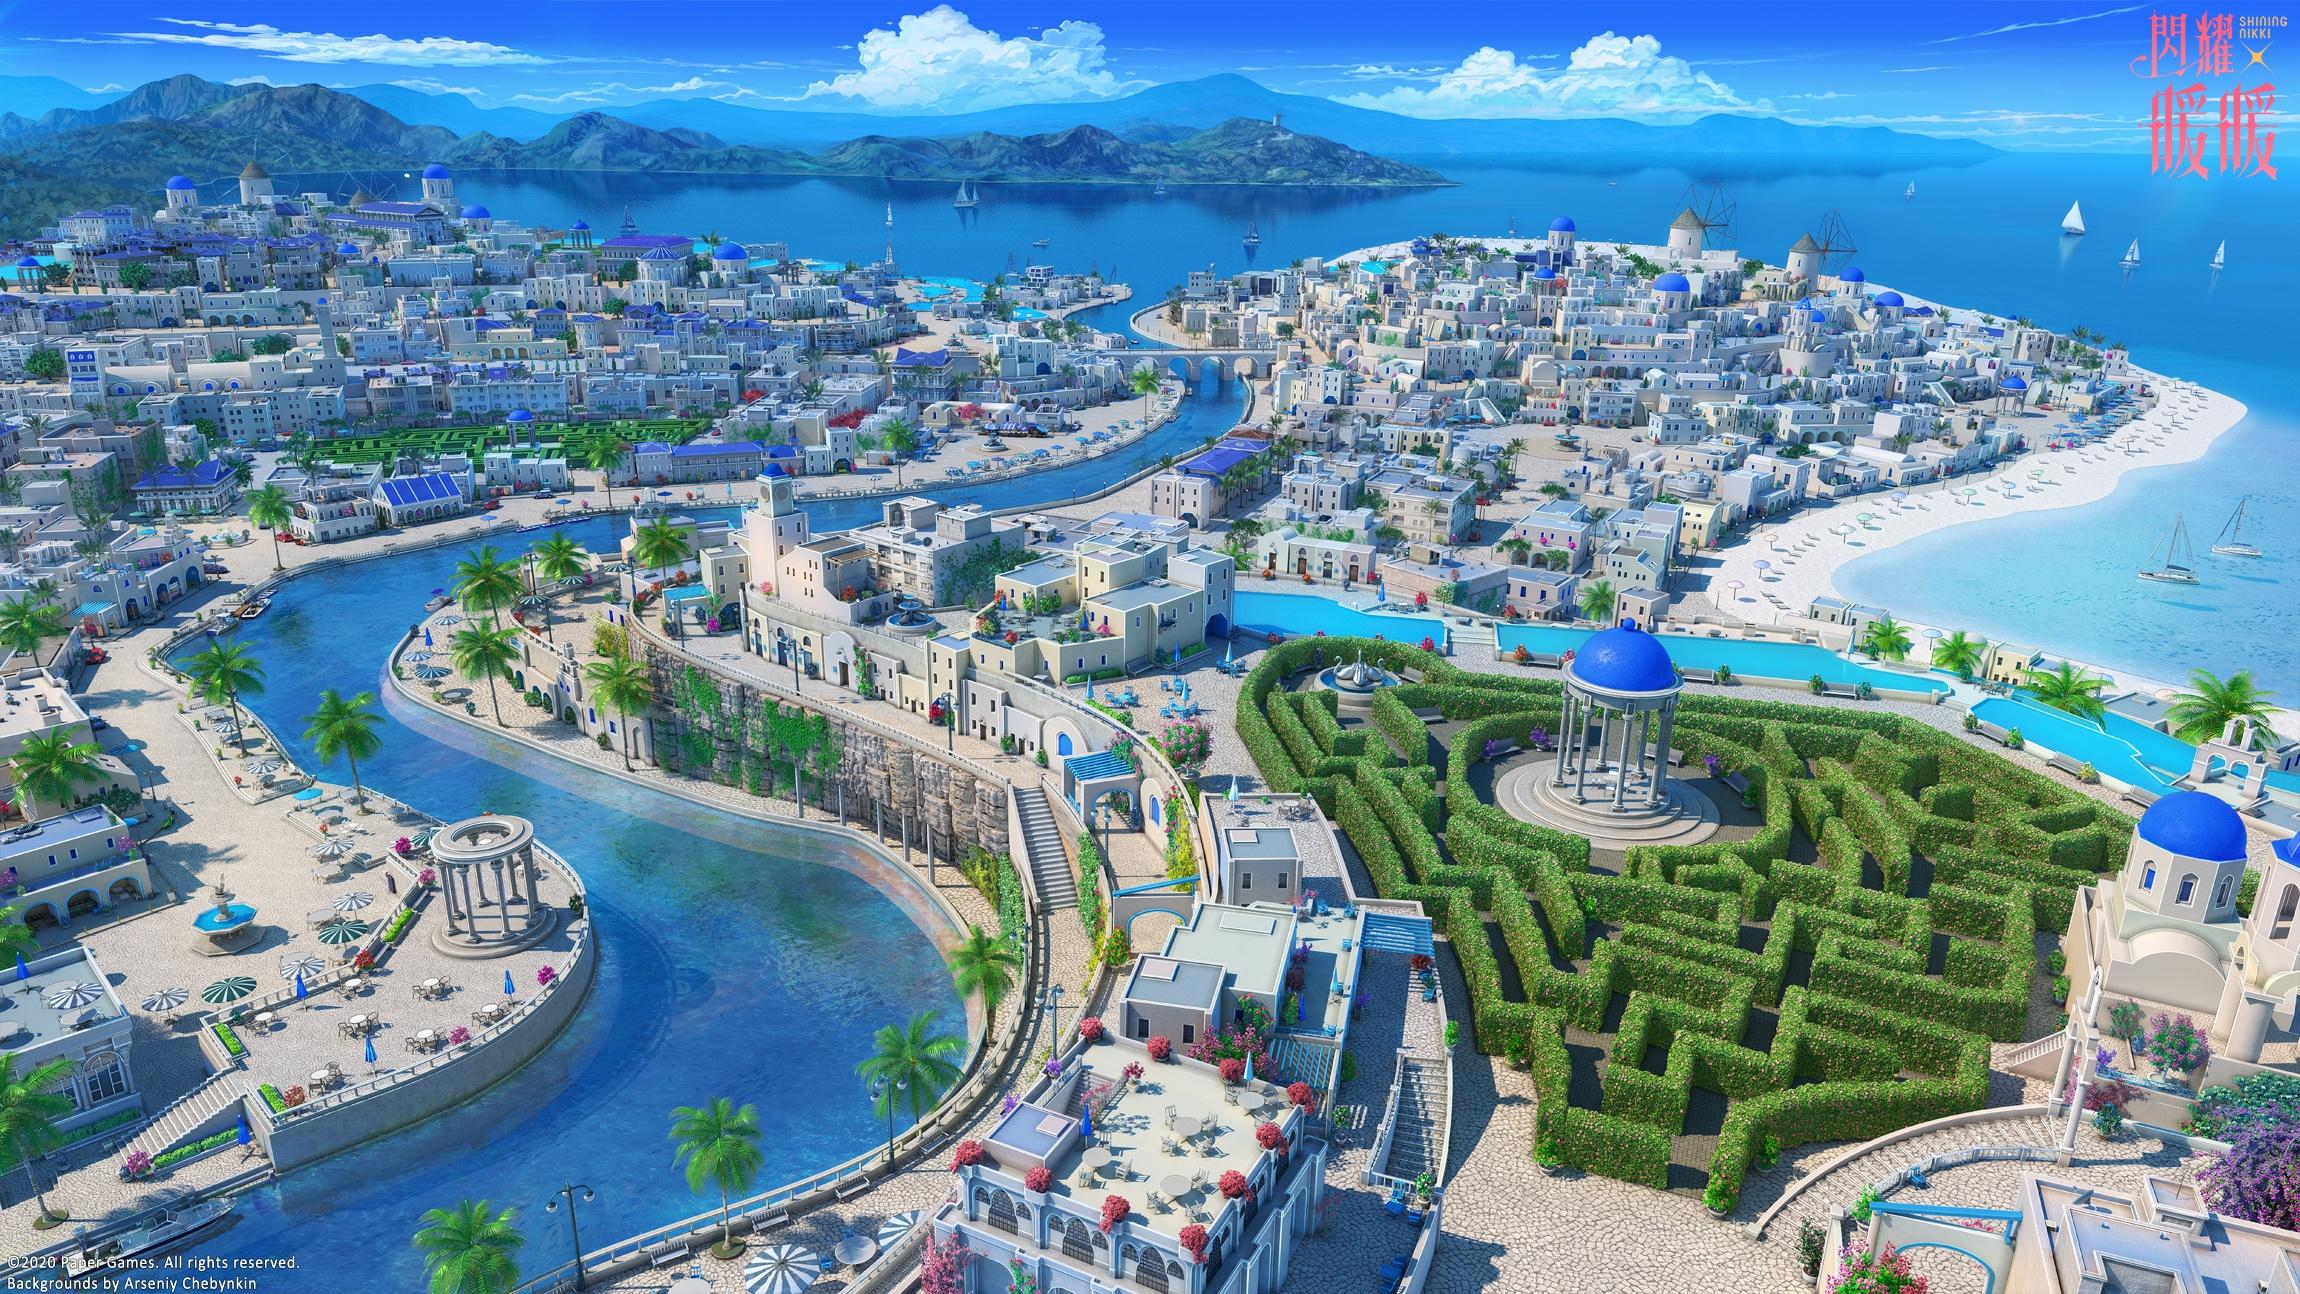 Anime City free image